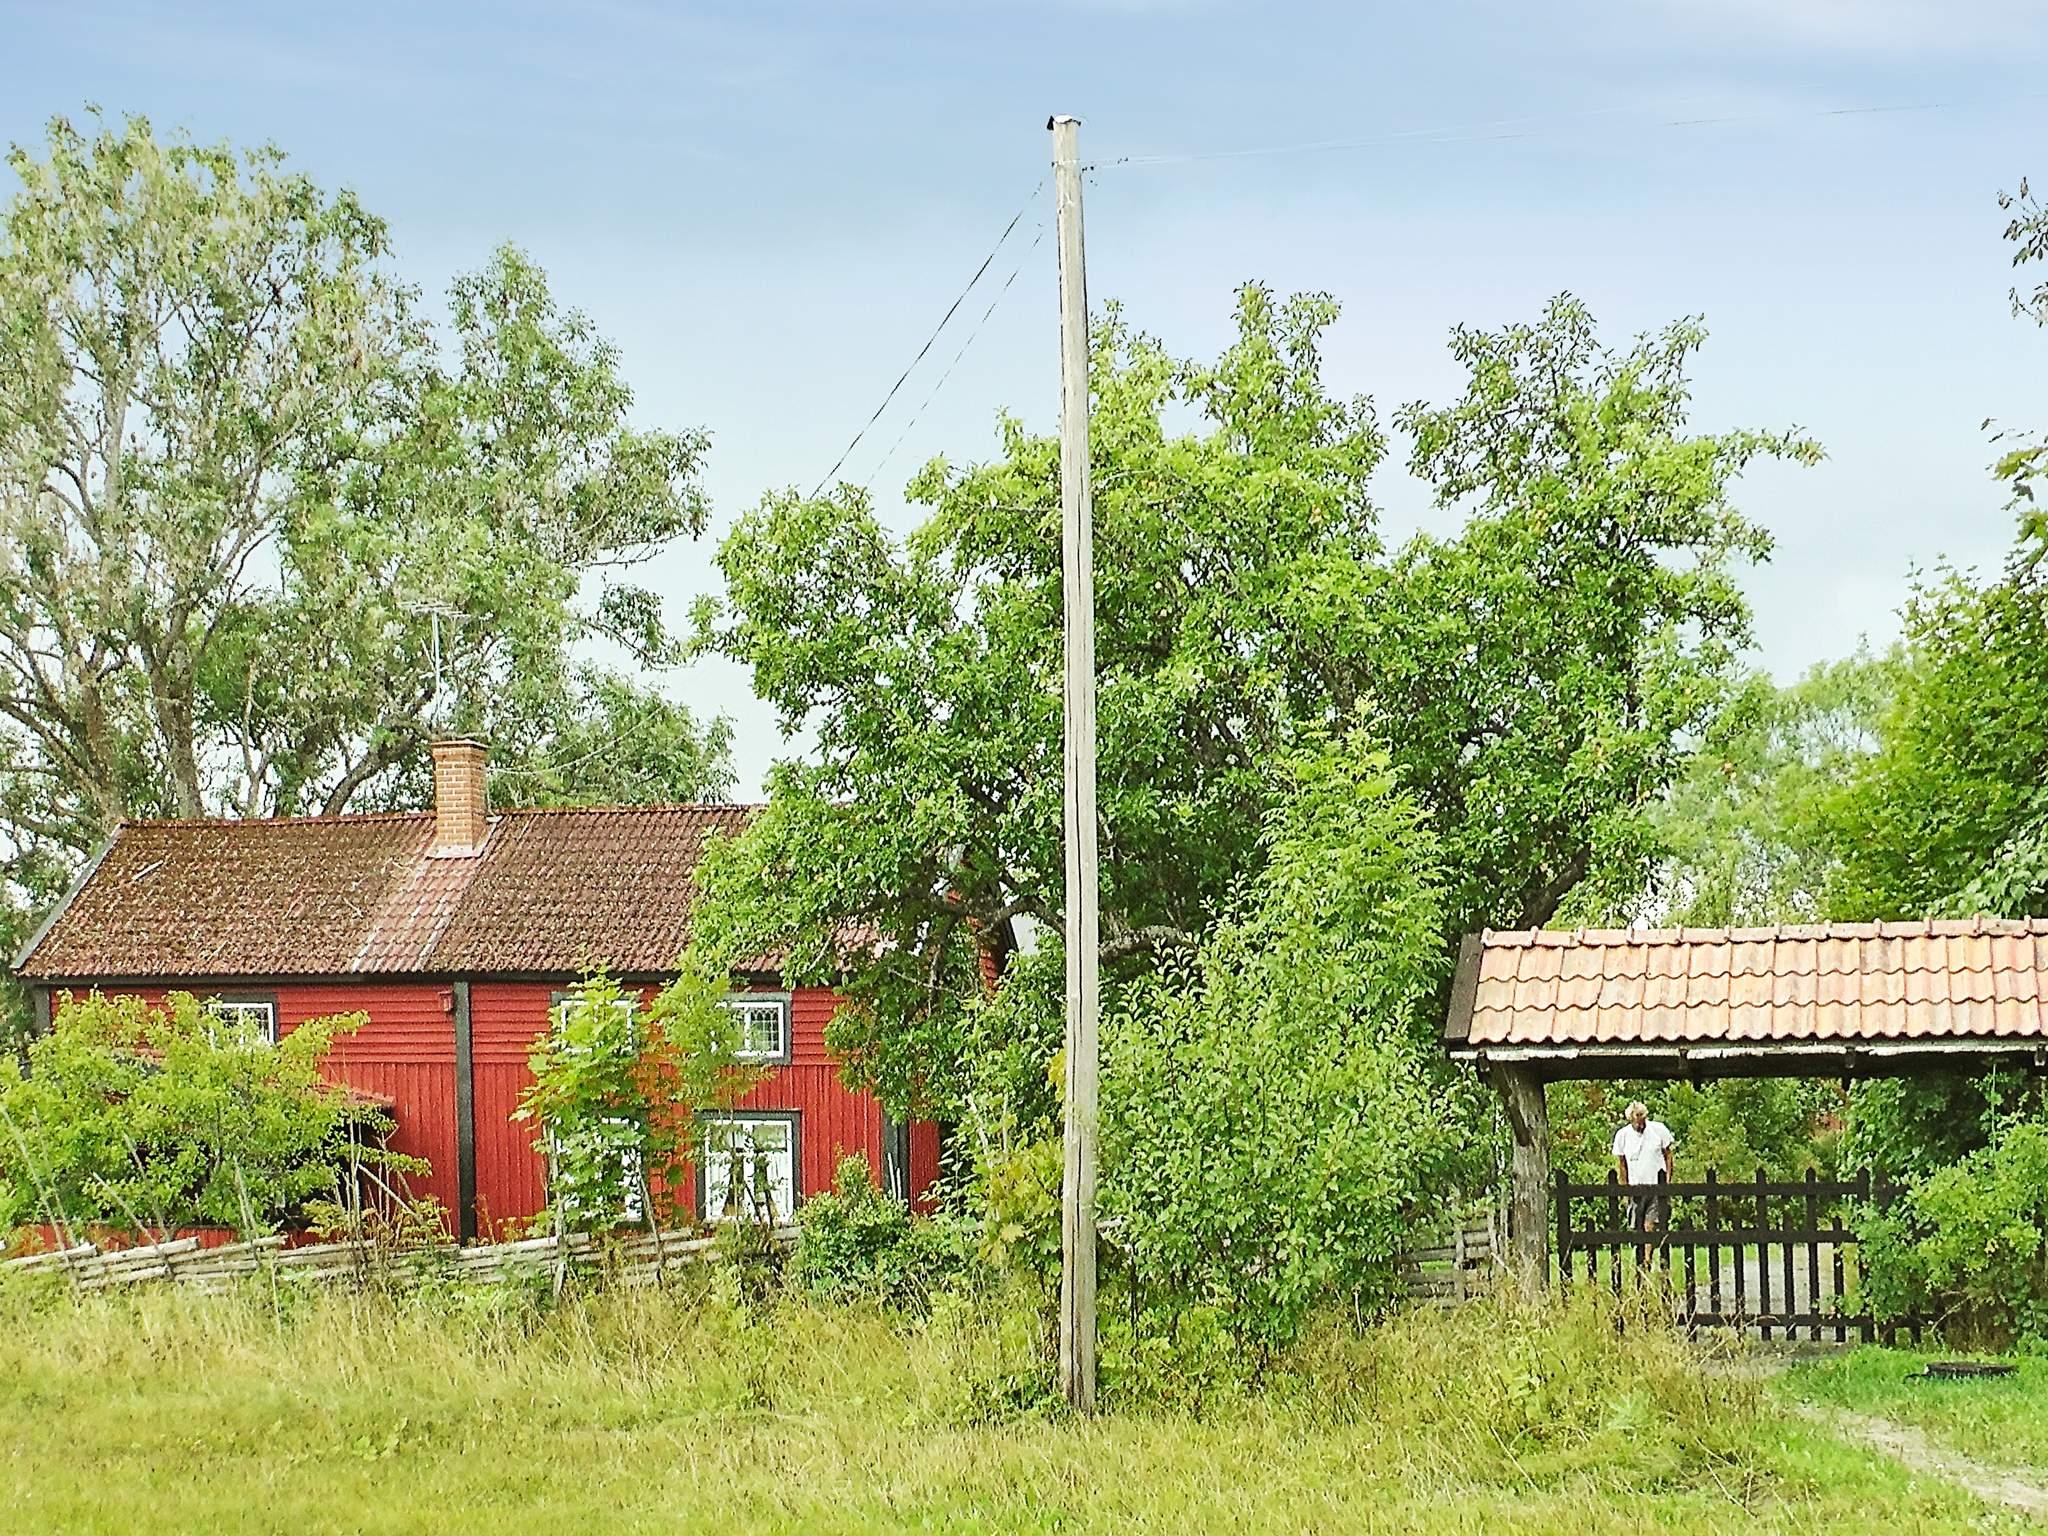 Ferienhaus Väddö (85466), Väddö, Region Stockholm, Mittelschweden, Schweden, Bild 13